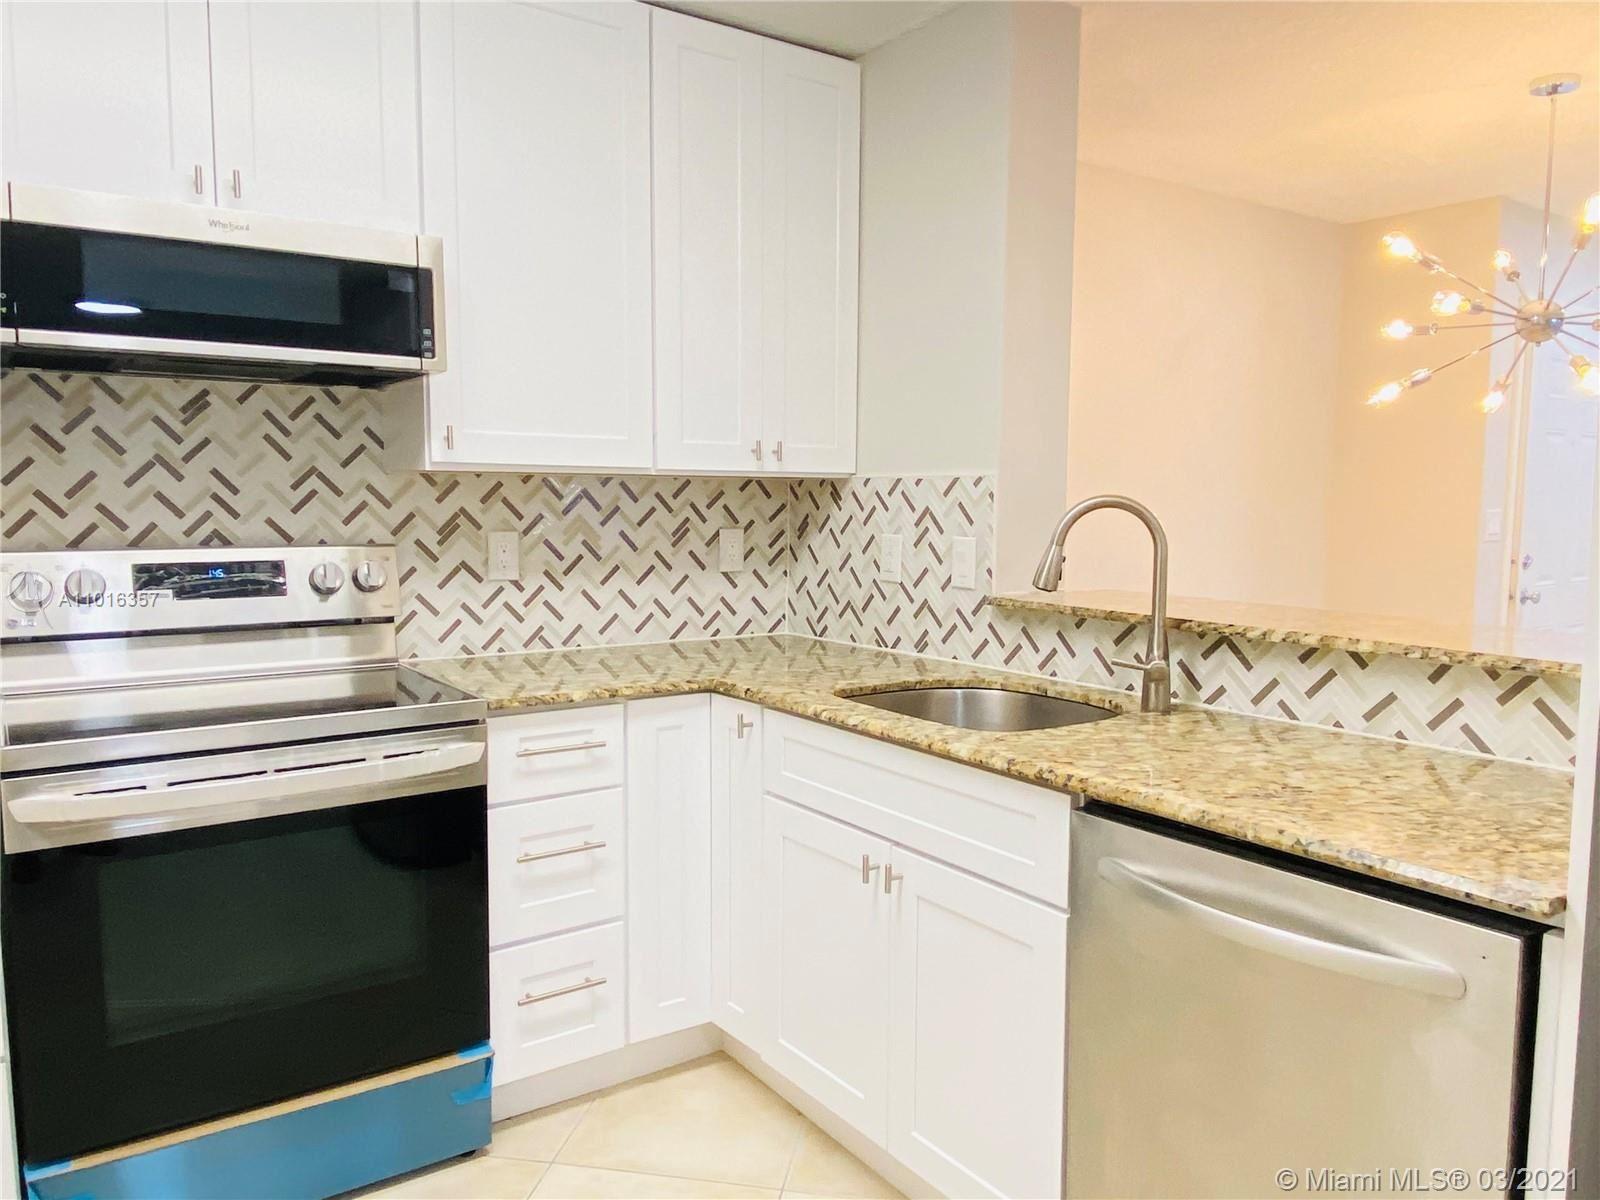 Photo of 509 E Sheridan St #103, Dania Beach, FL 33004 (MLS # A11016357)